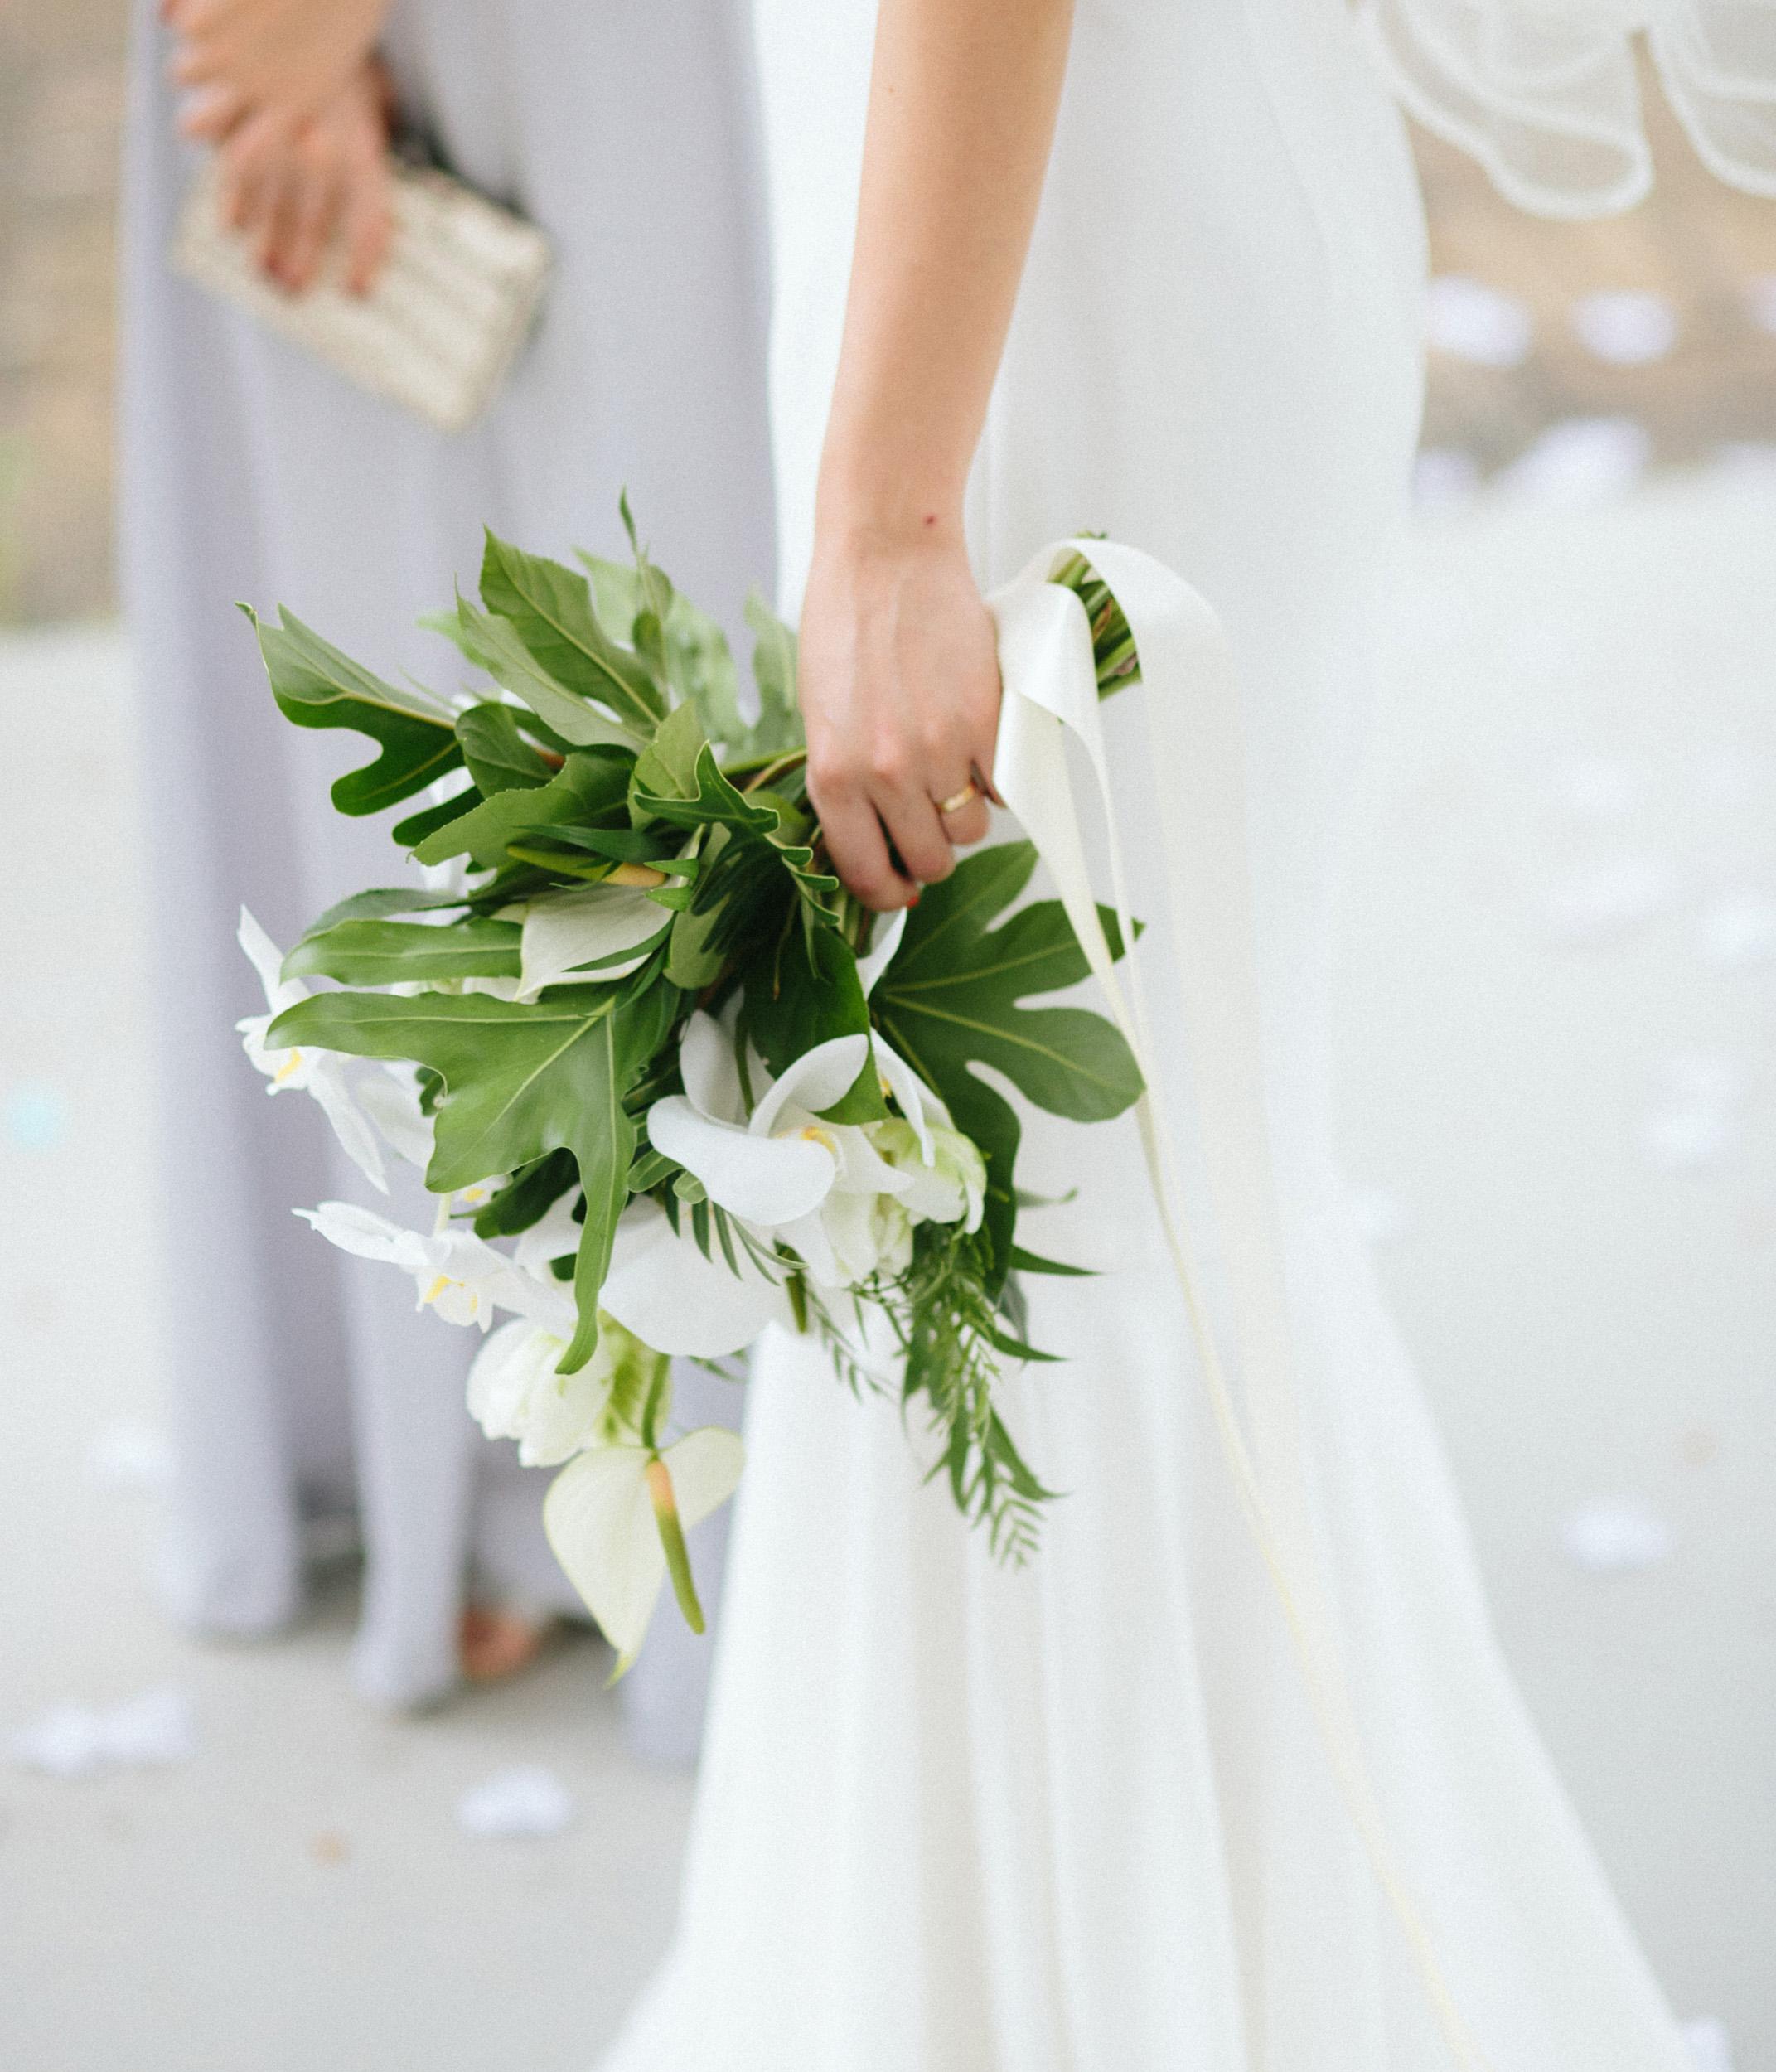 singapore-wedding-photographer-photography-wmt2017-053.jpg